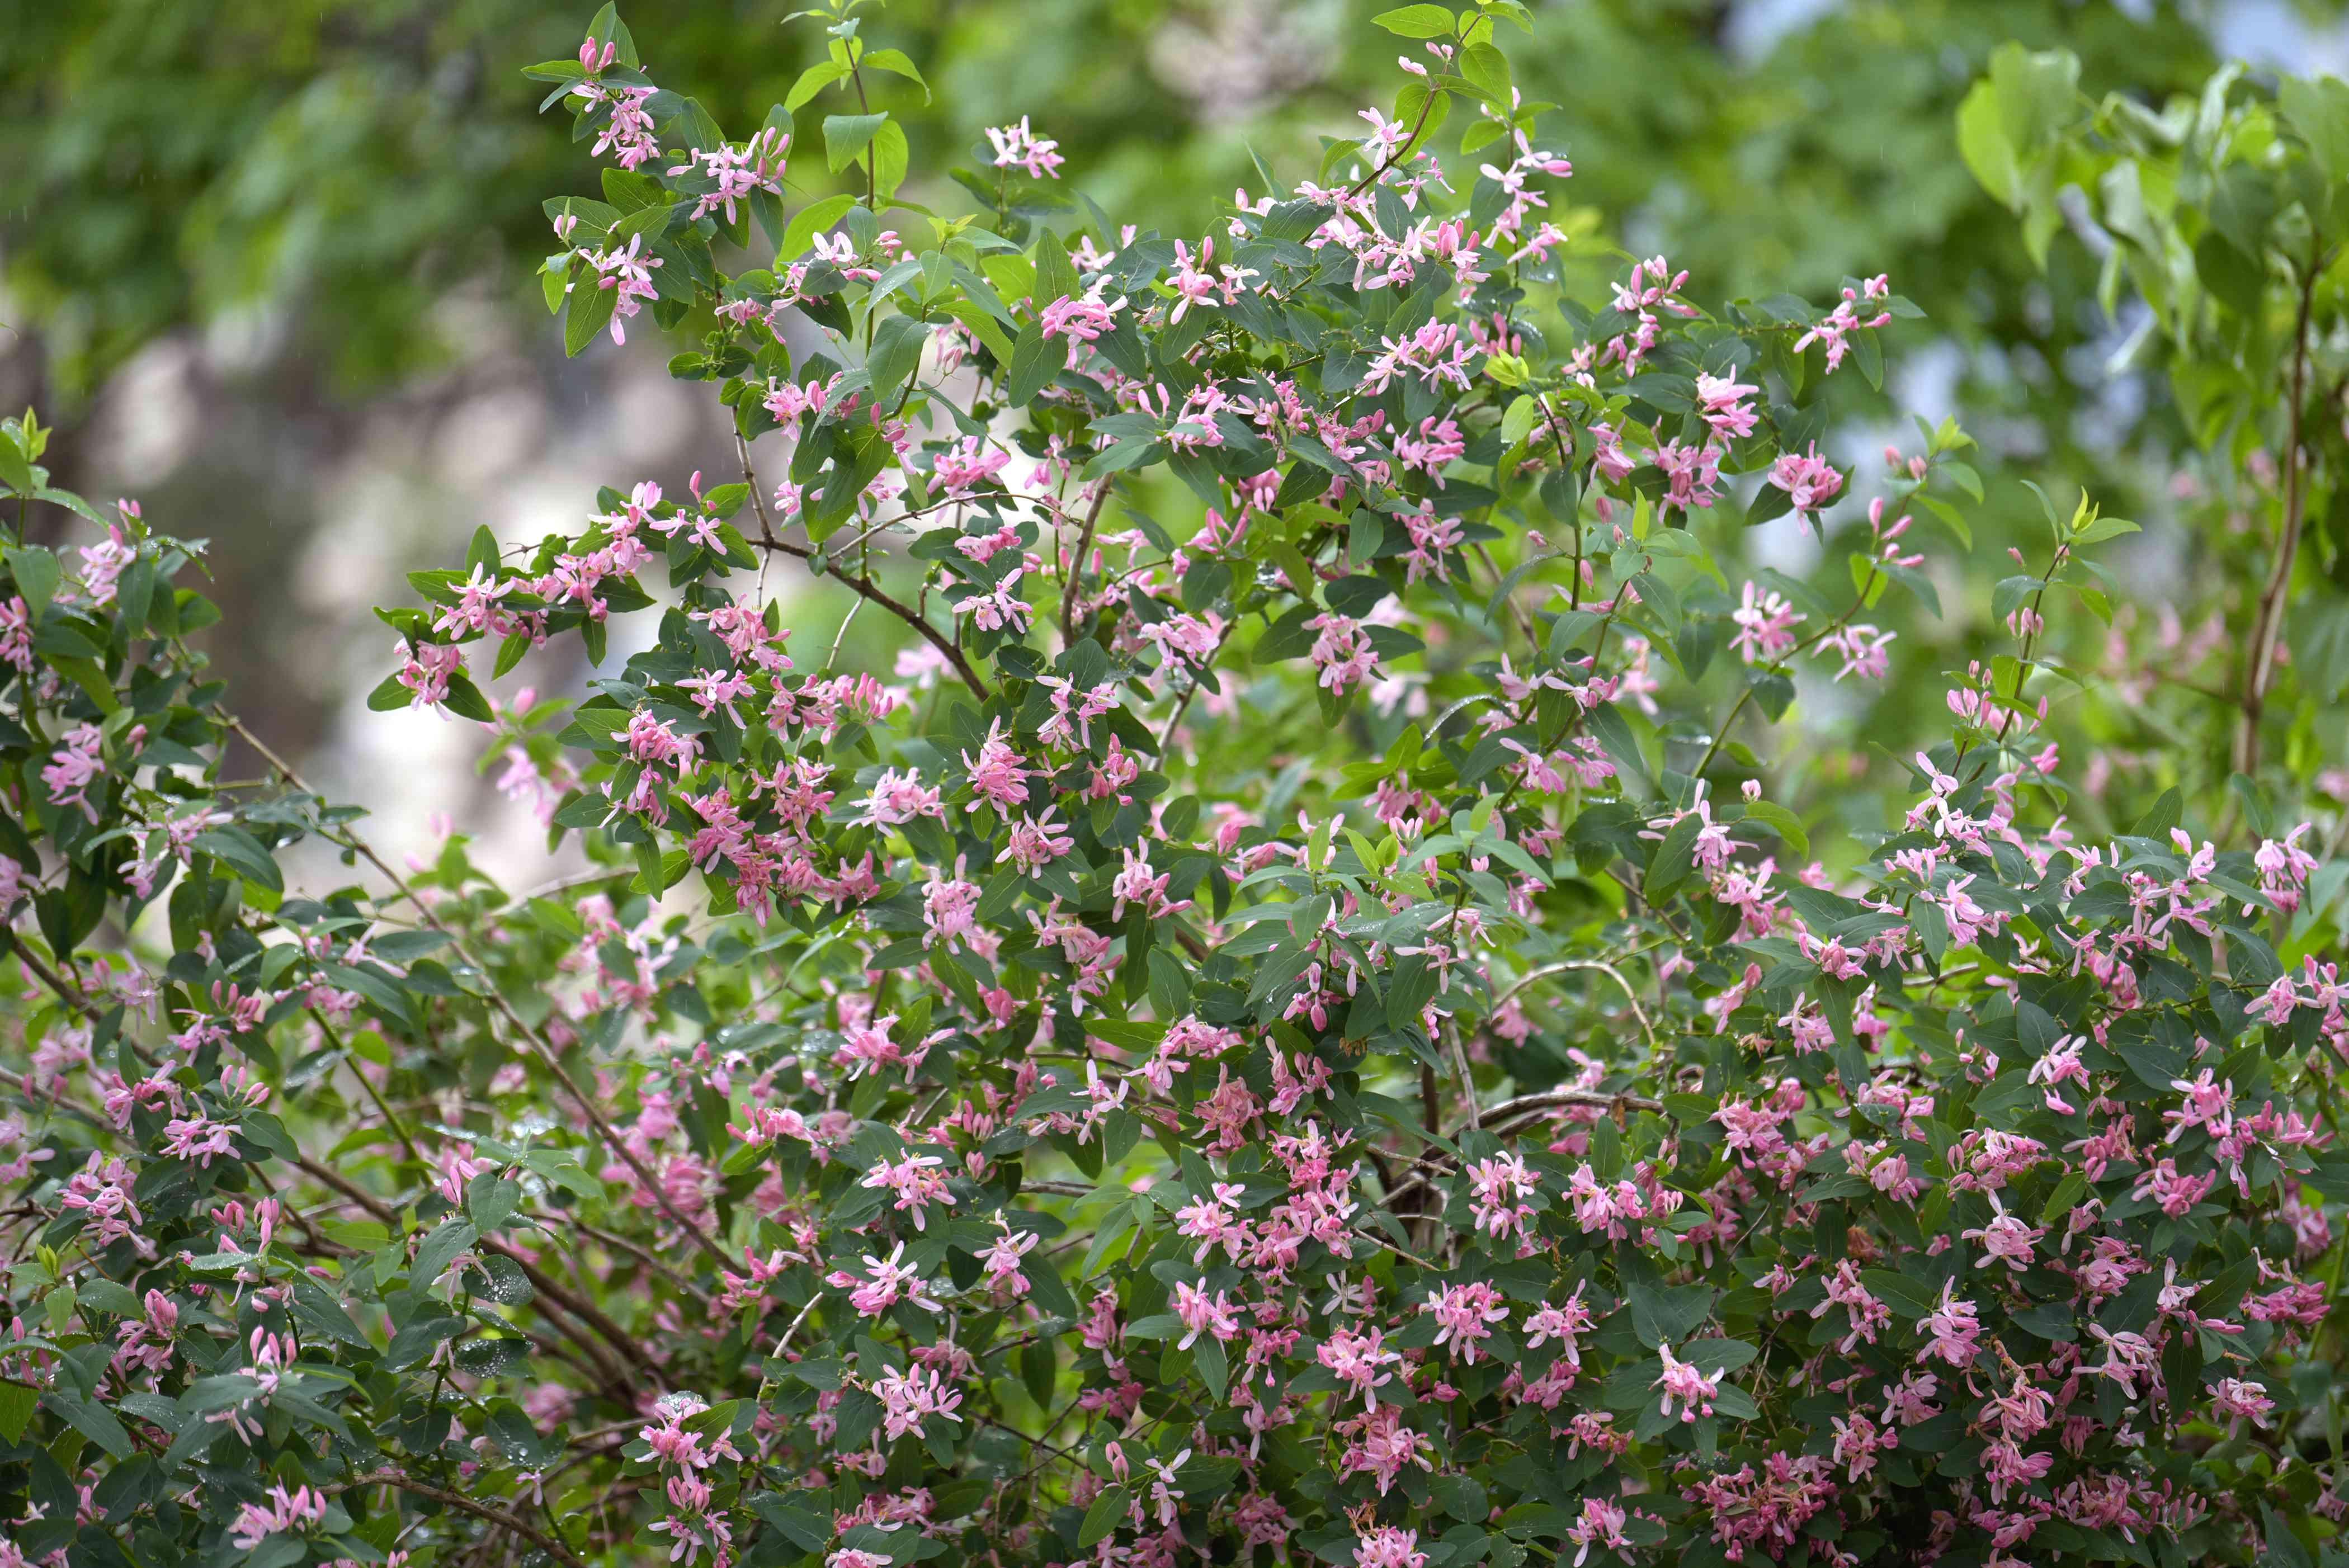 Bush honeysuckle shrub with small pink flowers